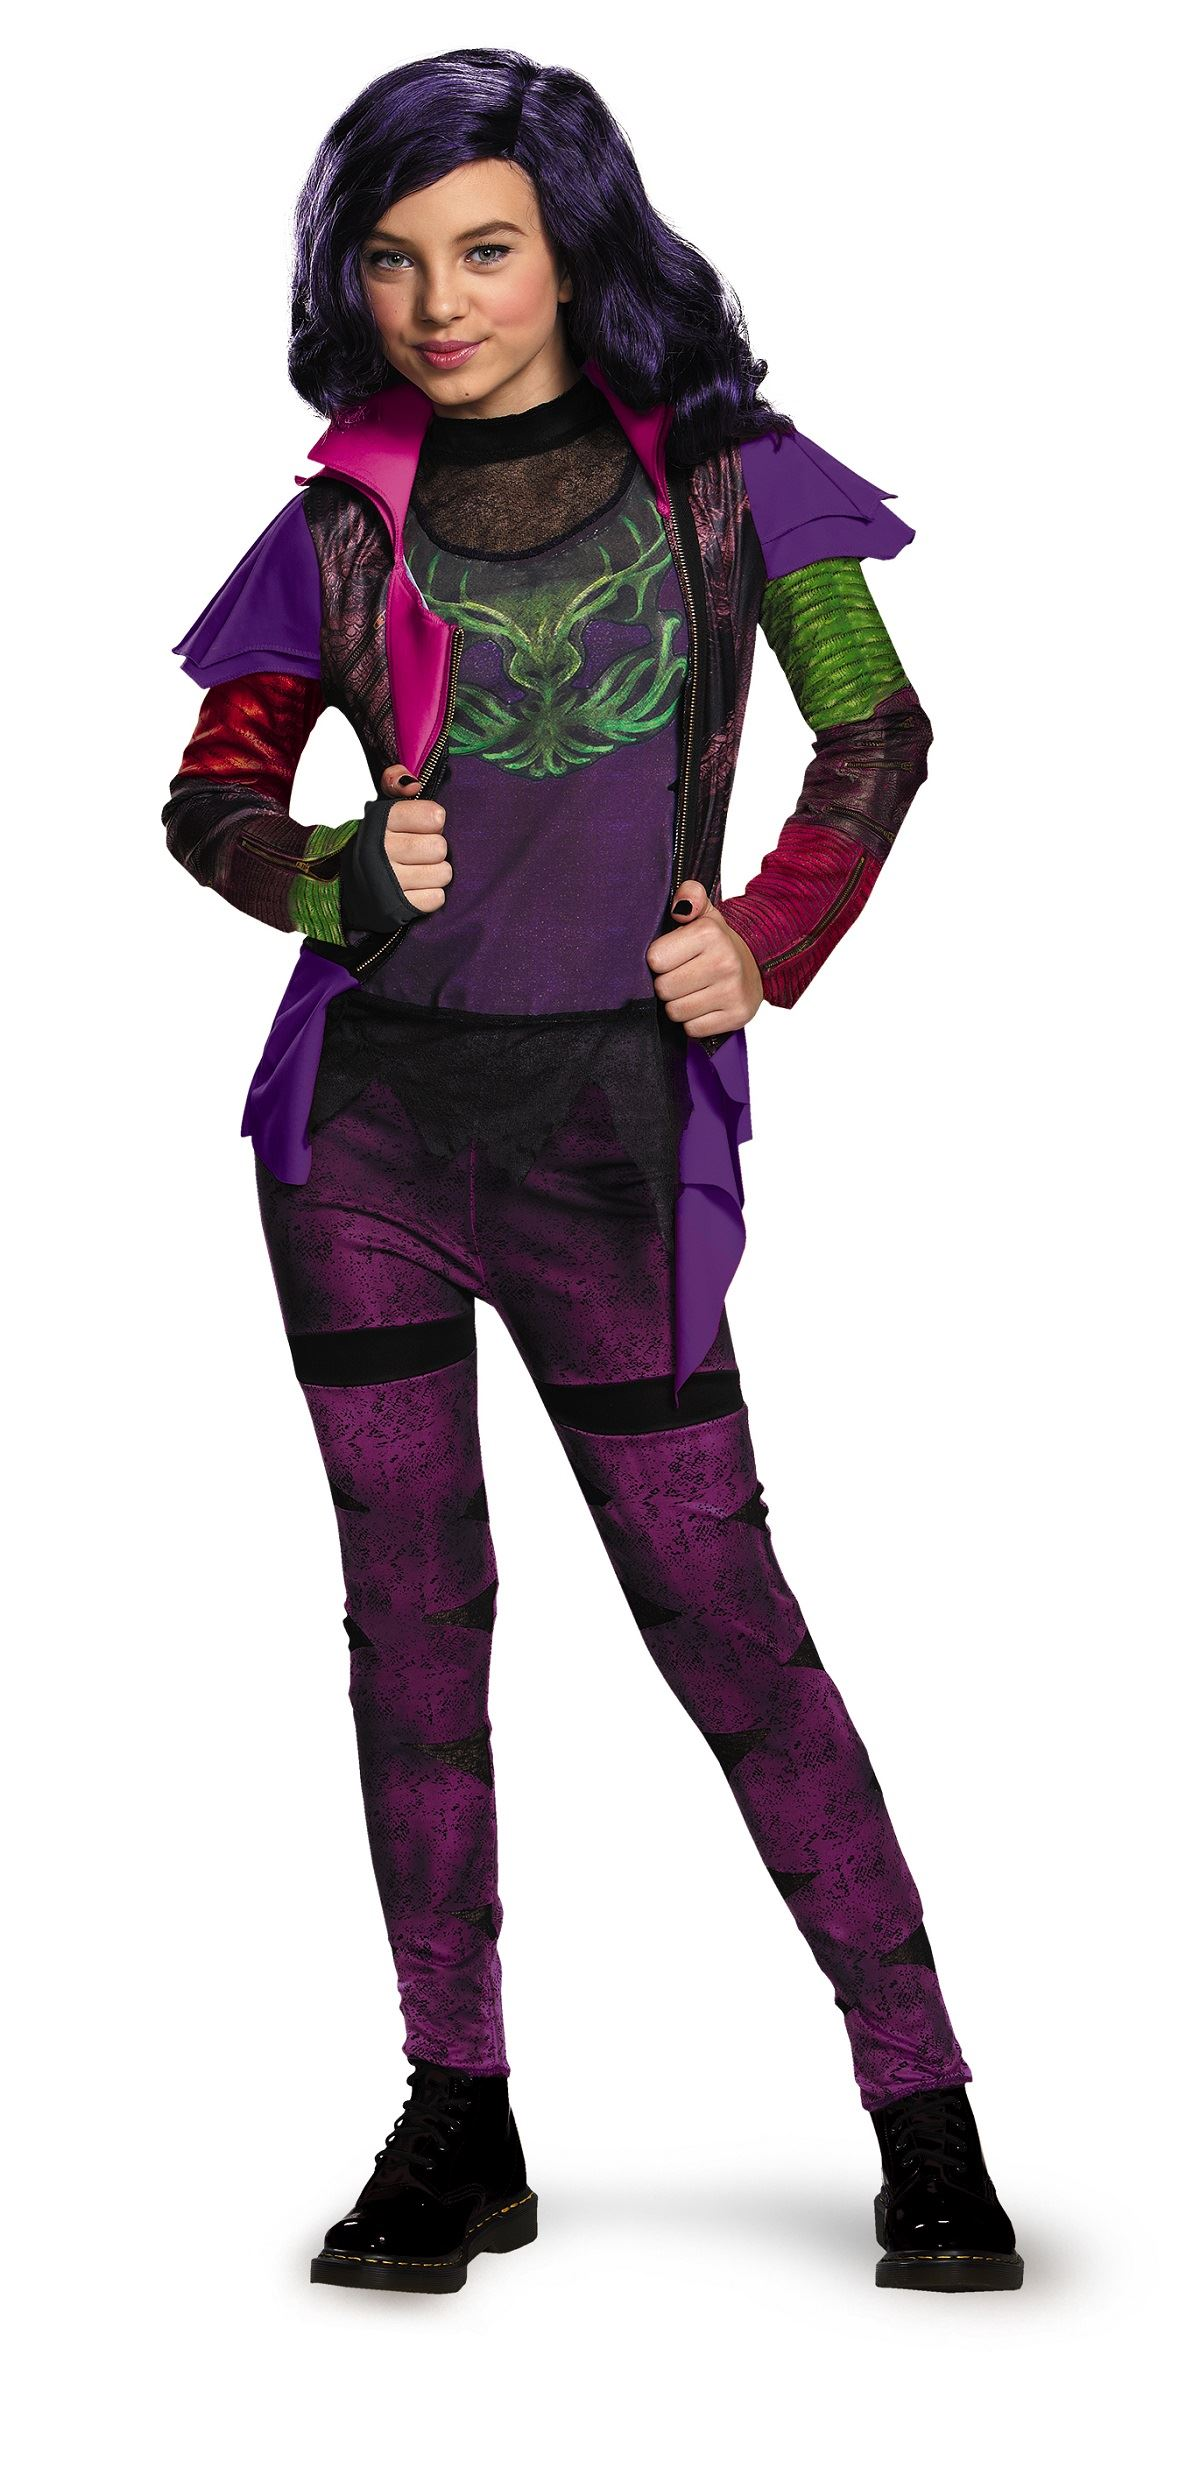 Kids Disney Descendants Mal Girls Costume 3699 The Costume Land